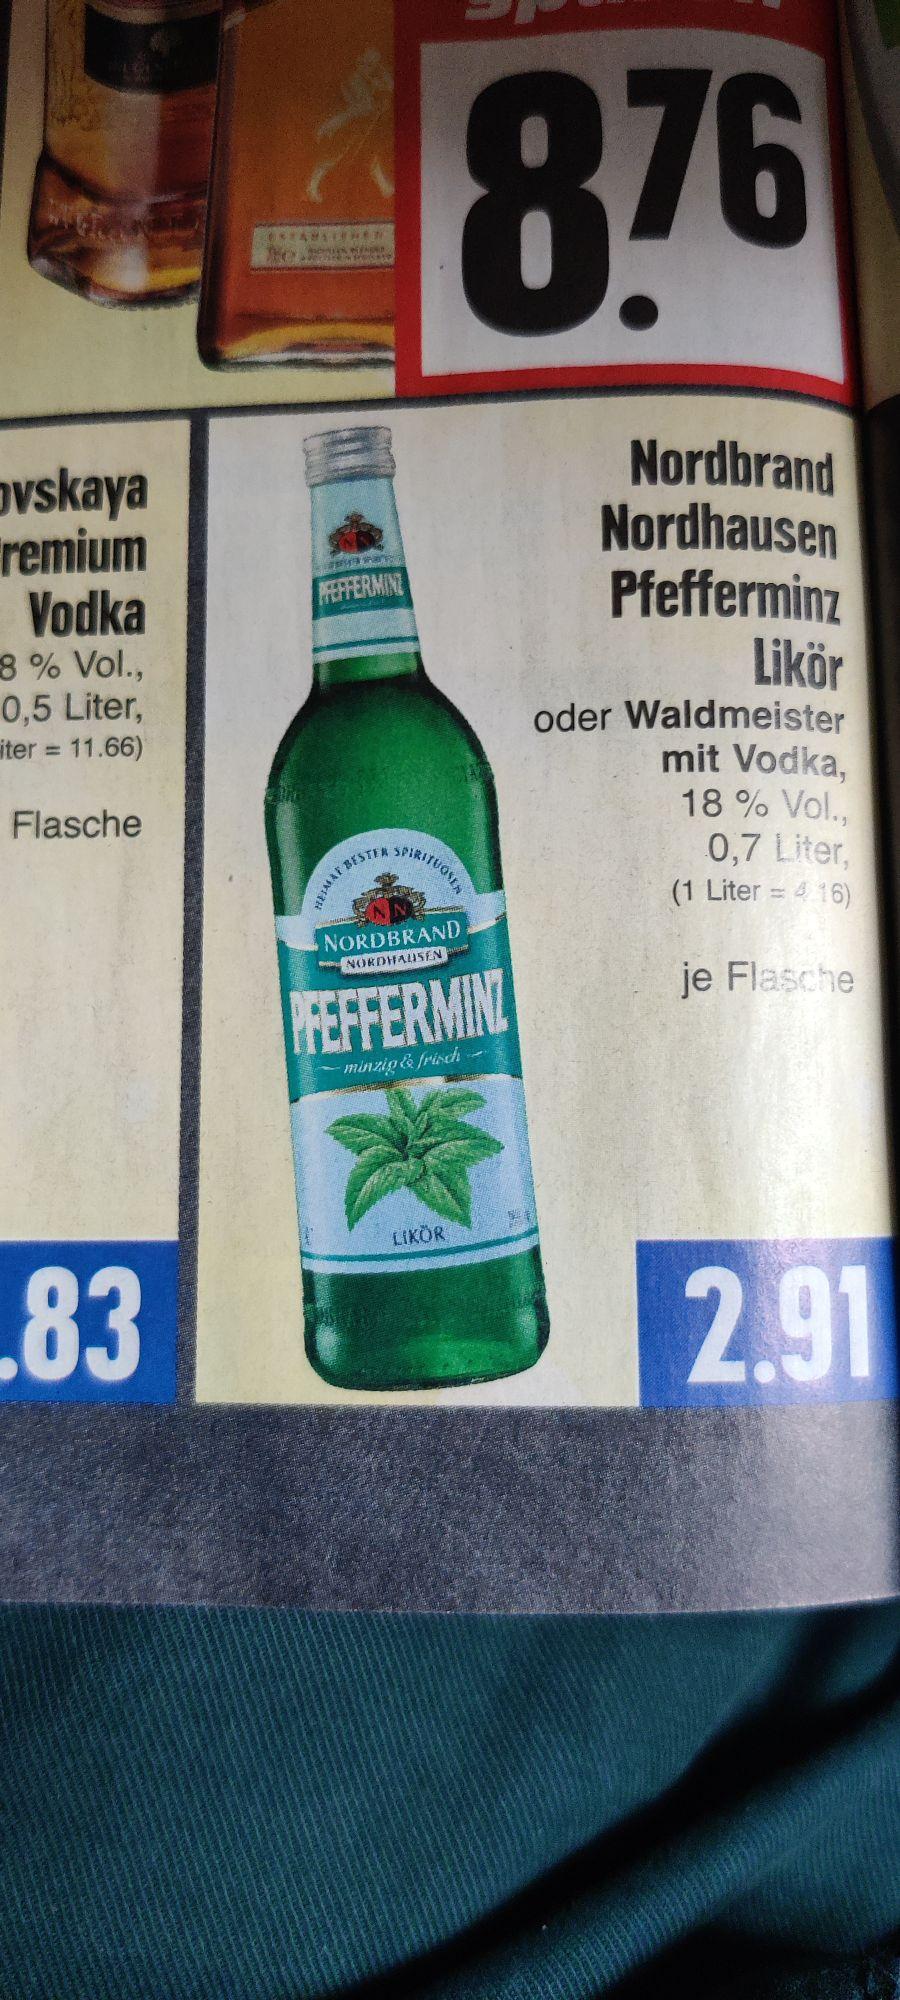 Pfeffi Nordbrand Pfefferminz Likör | Edeka Offline